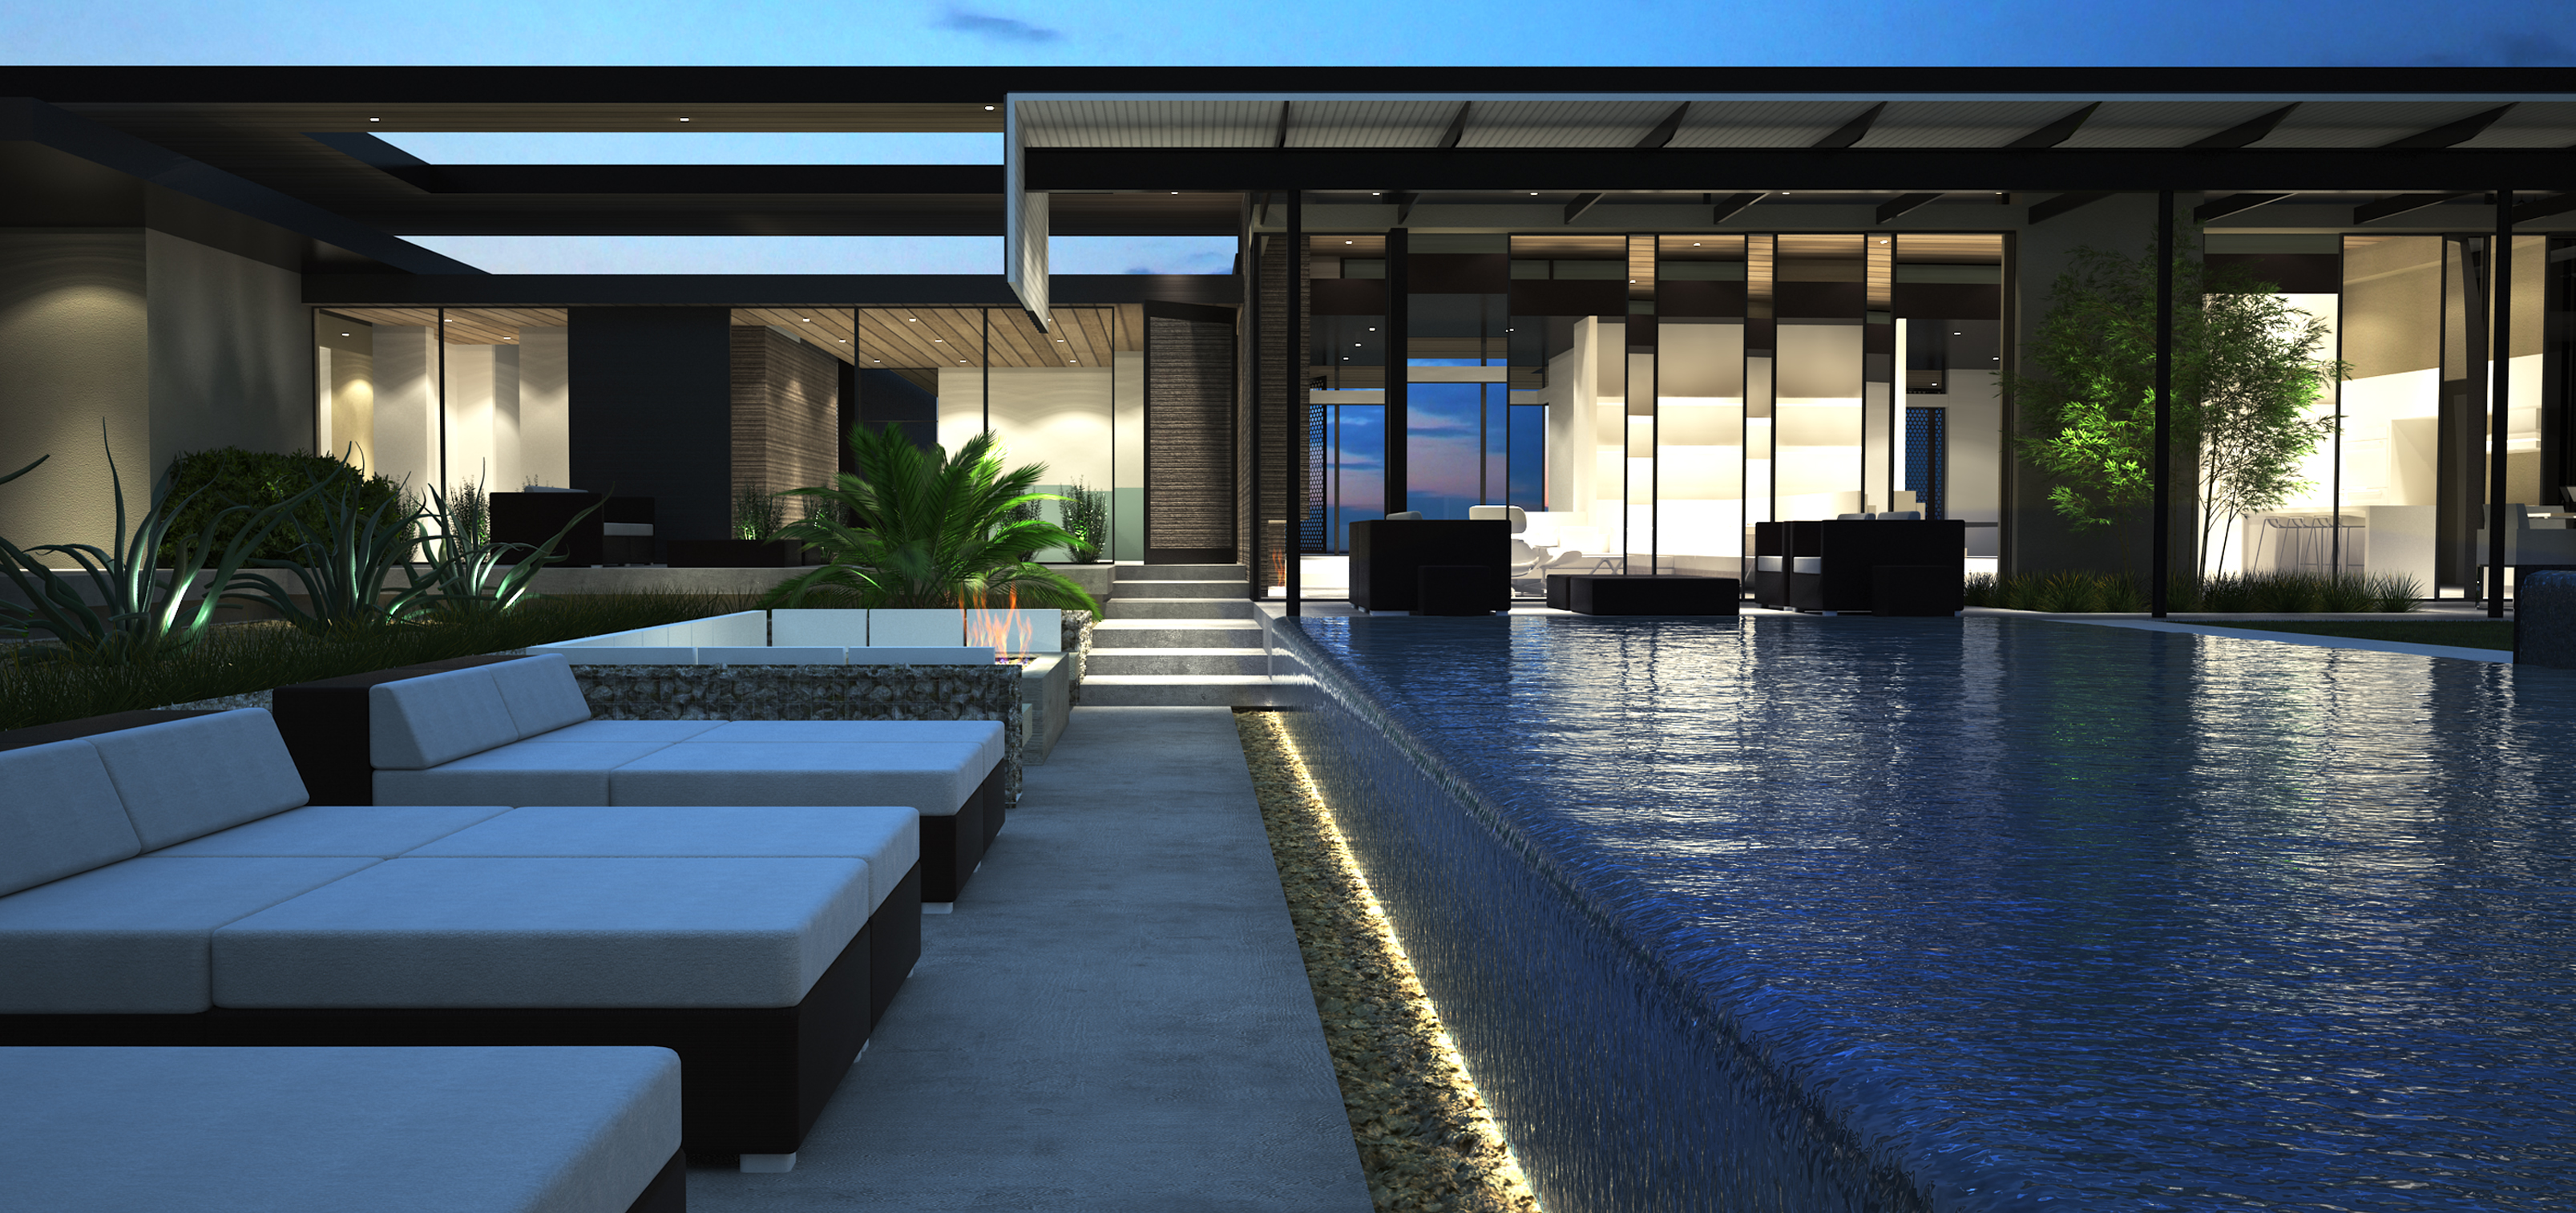 MO-exterior pool